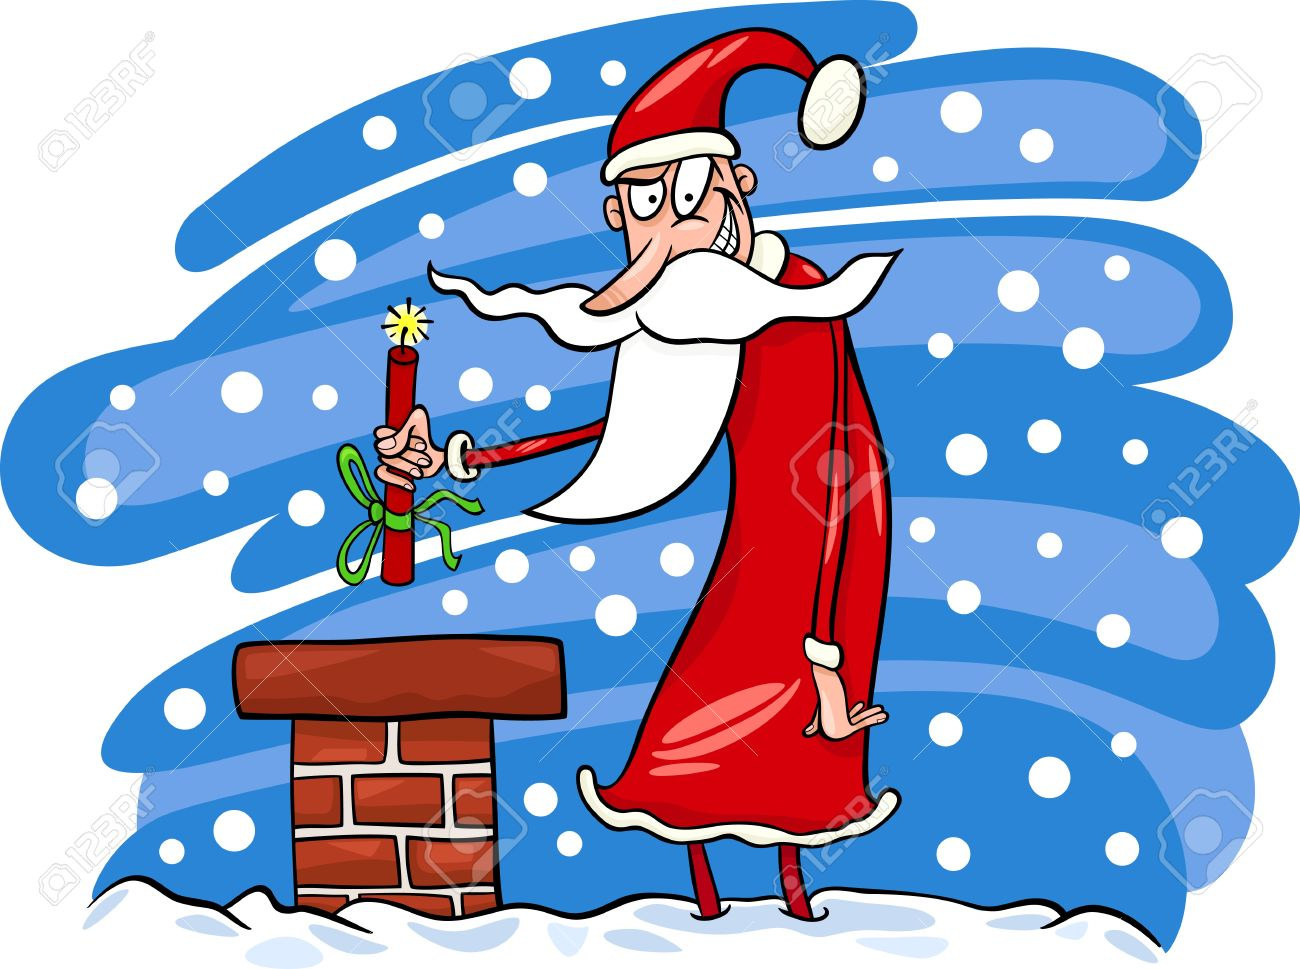 cartoon illustration of malicious funny santa claus or papa noel